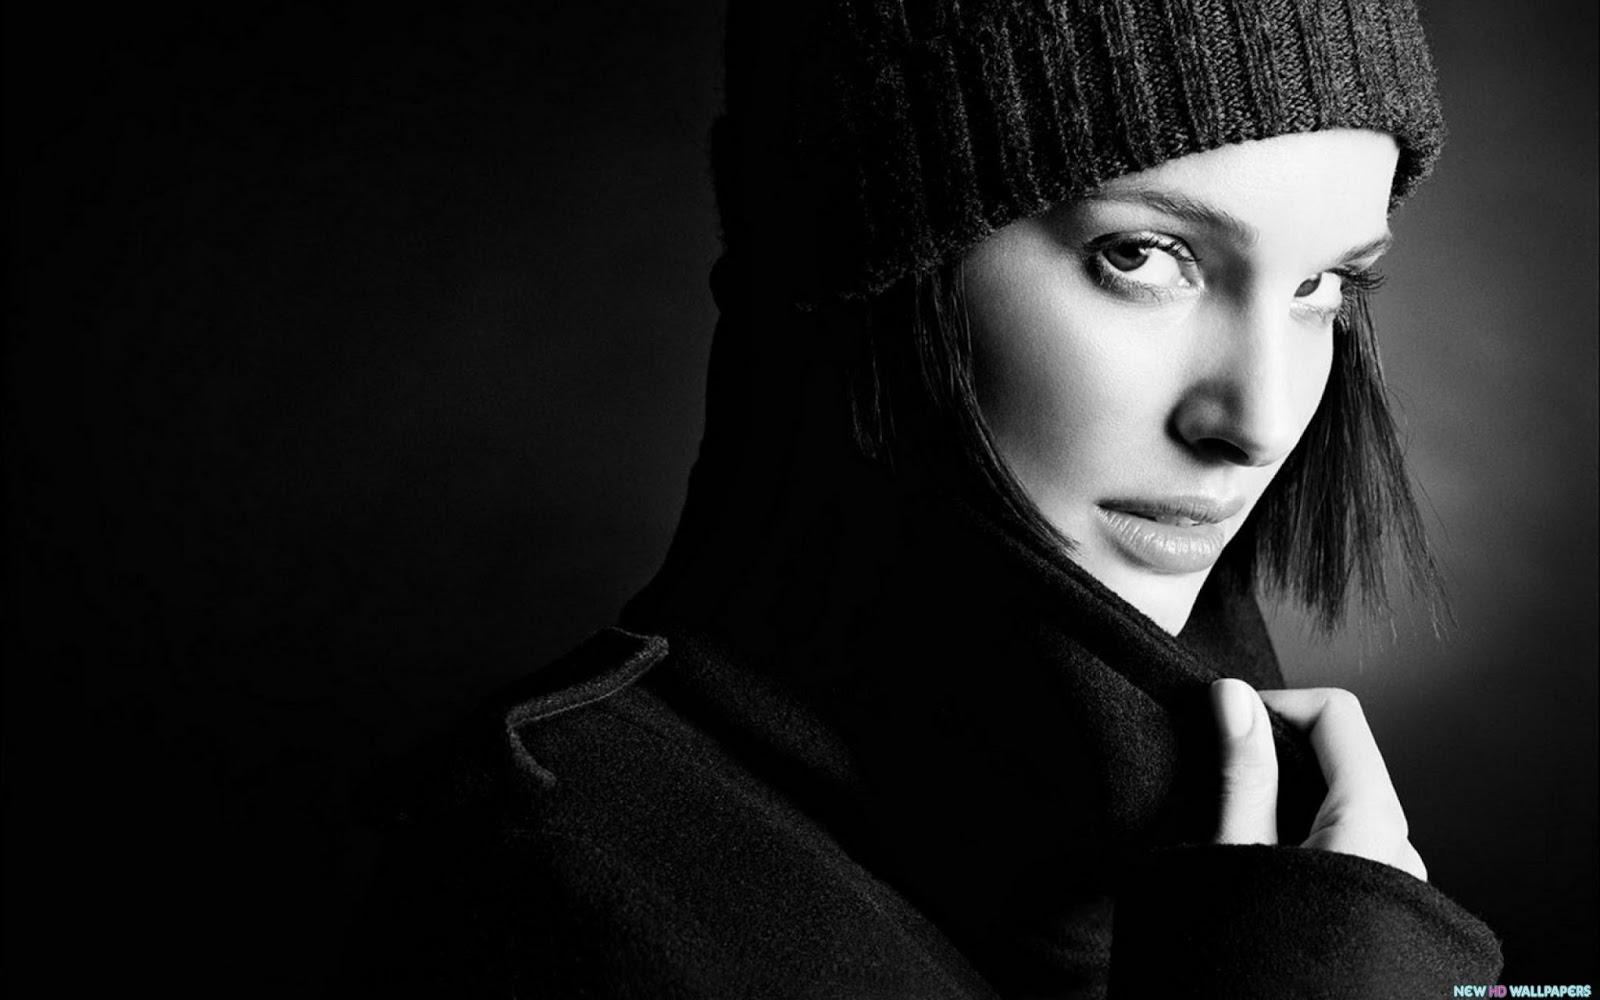 Natalie Portman Beautiful Winter Cap Wallpaper HD